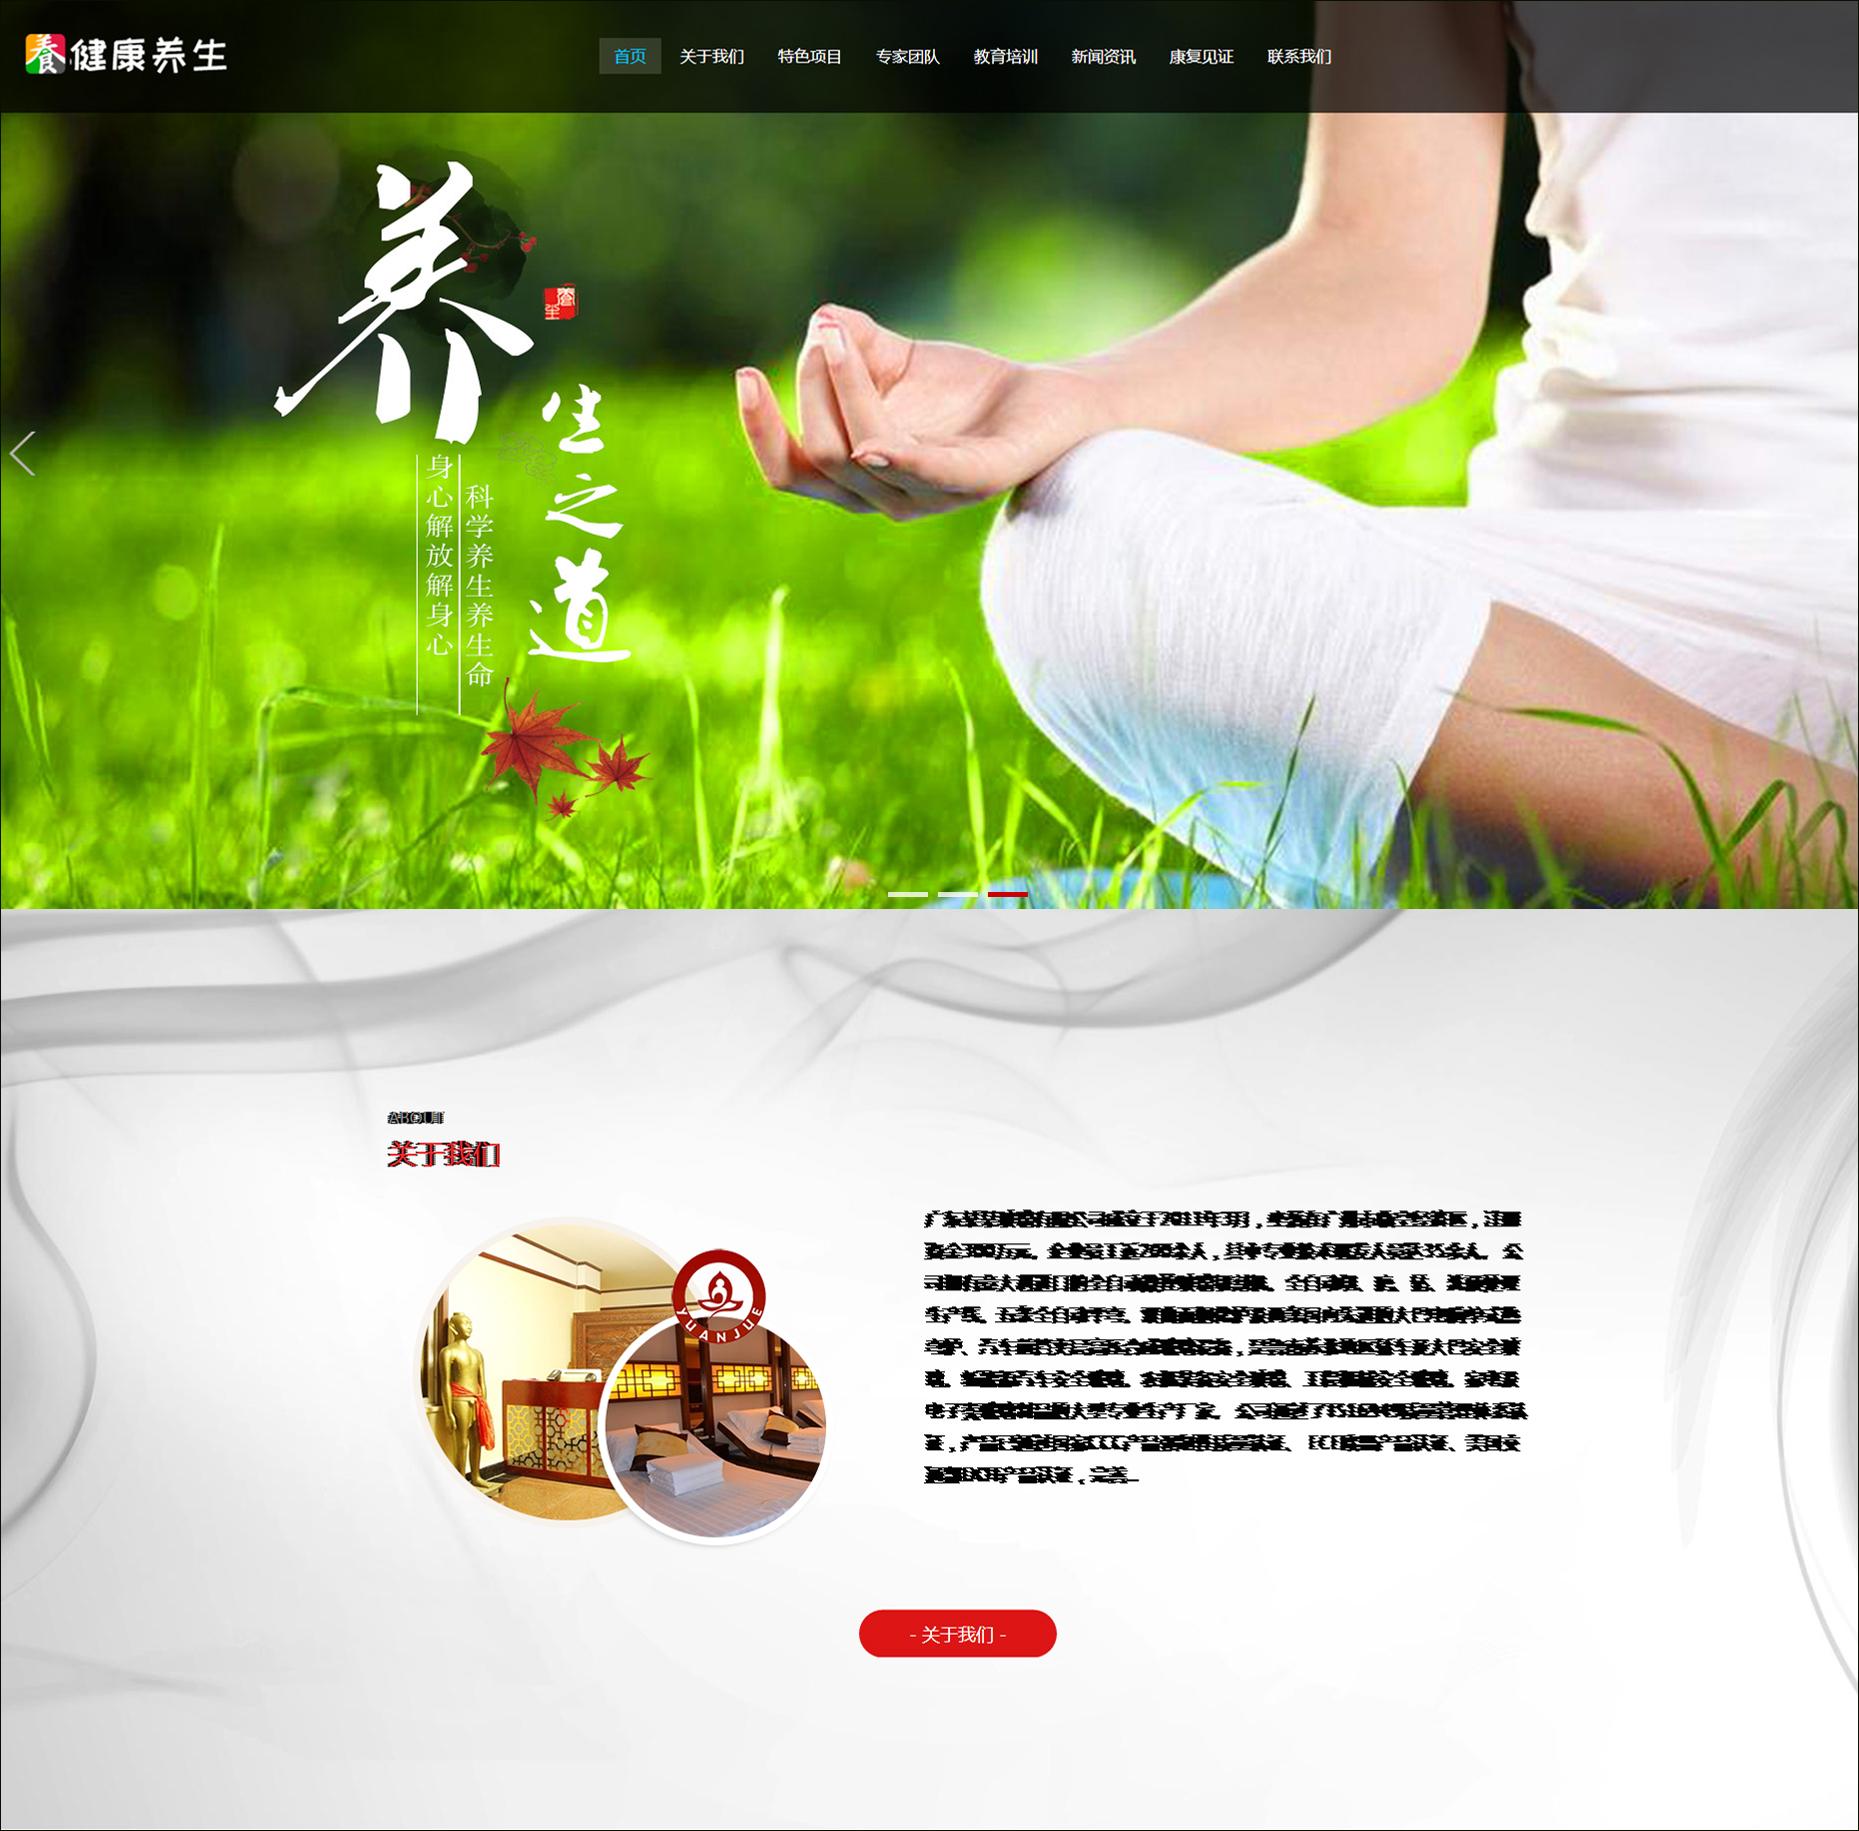 HTML5响应式经络养生健康网站源码 DEDECMS织梦模板(自适应手机端